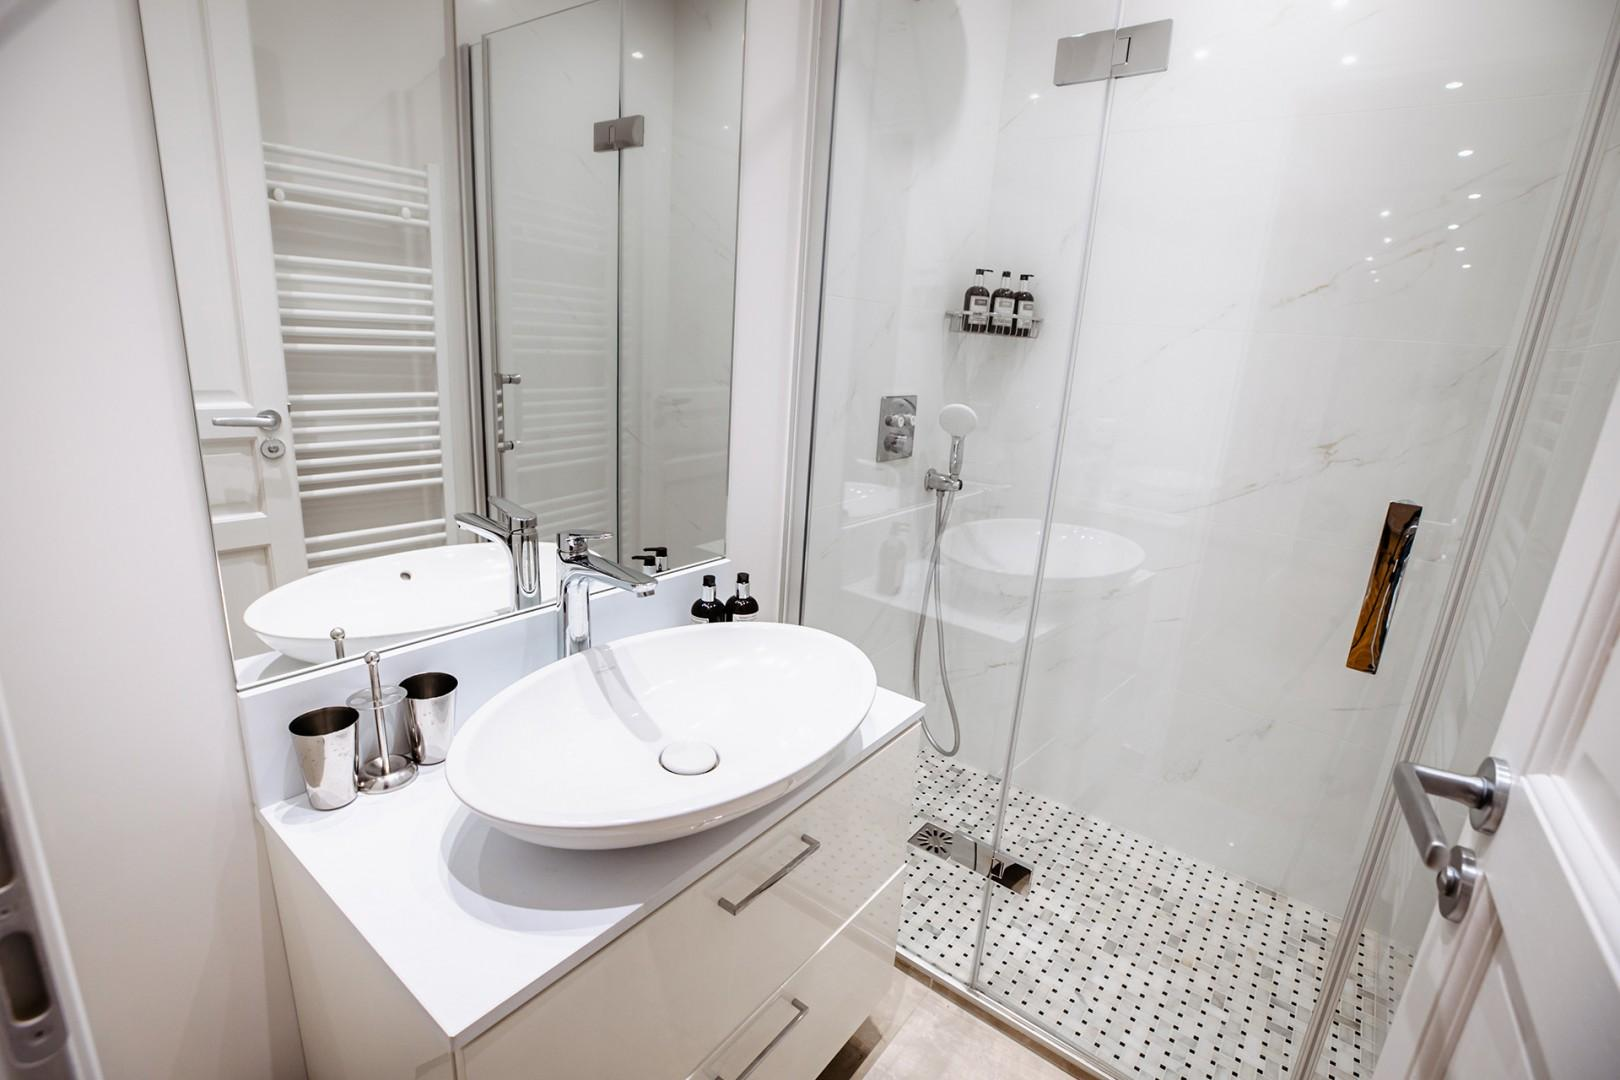 Bathroom 1 is located near bedroom 1